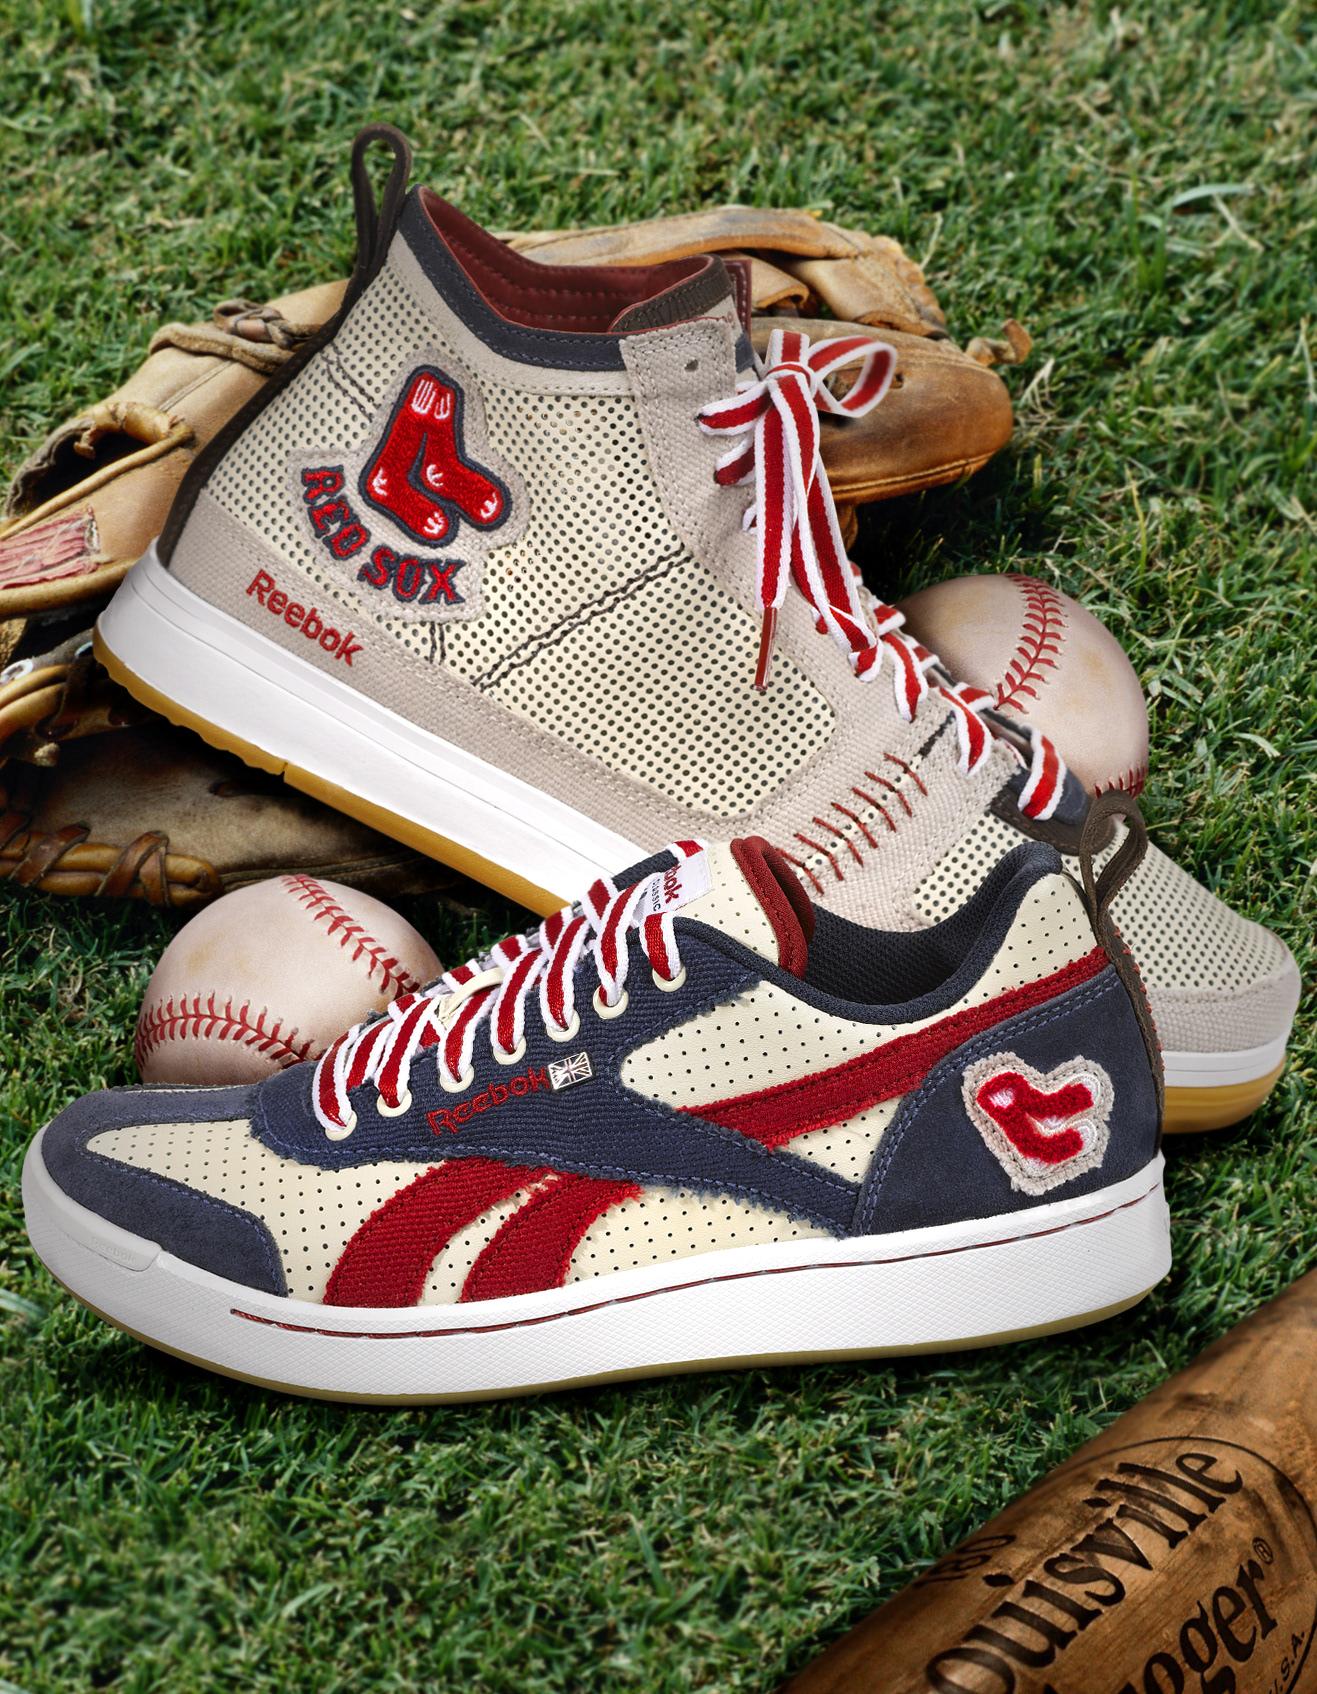 e56ec1bd8890 Anthony Petrie - Reebok x MLB Footwear